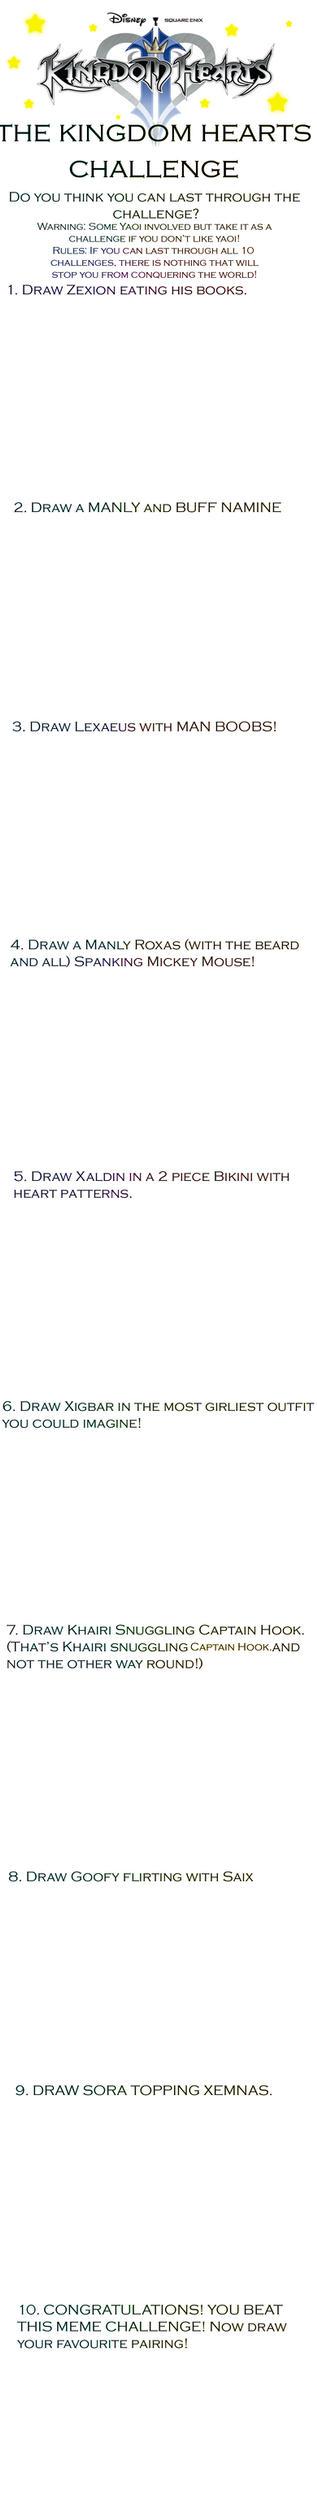 Kingdom Hearts Meme Challenge by BlackSapphireFlame